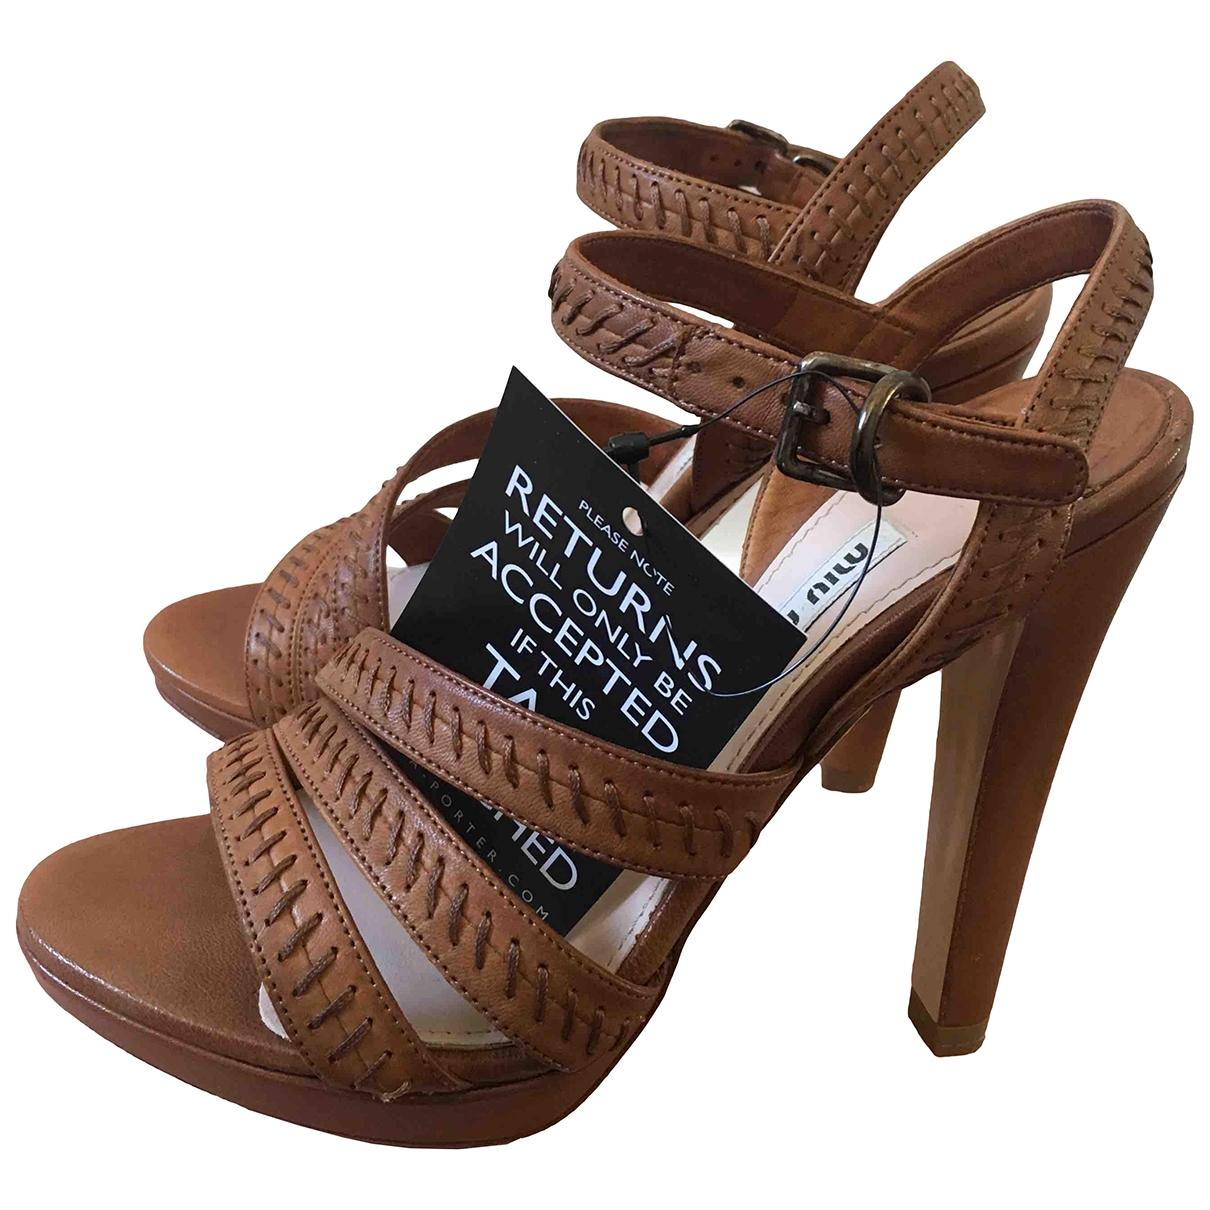 Miu Miu - Sandales   pour femme en cuir - camel